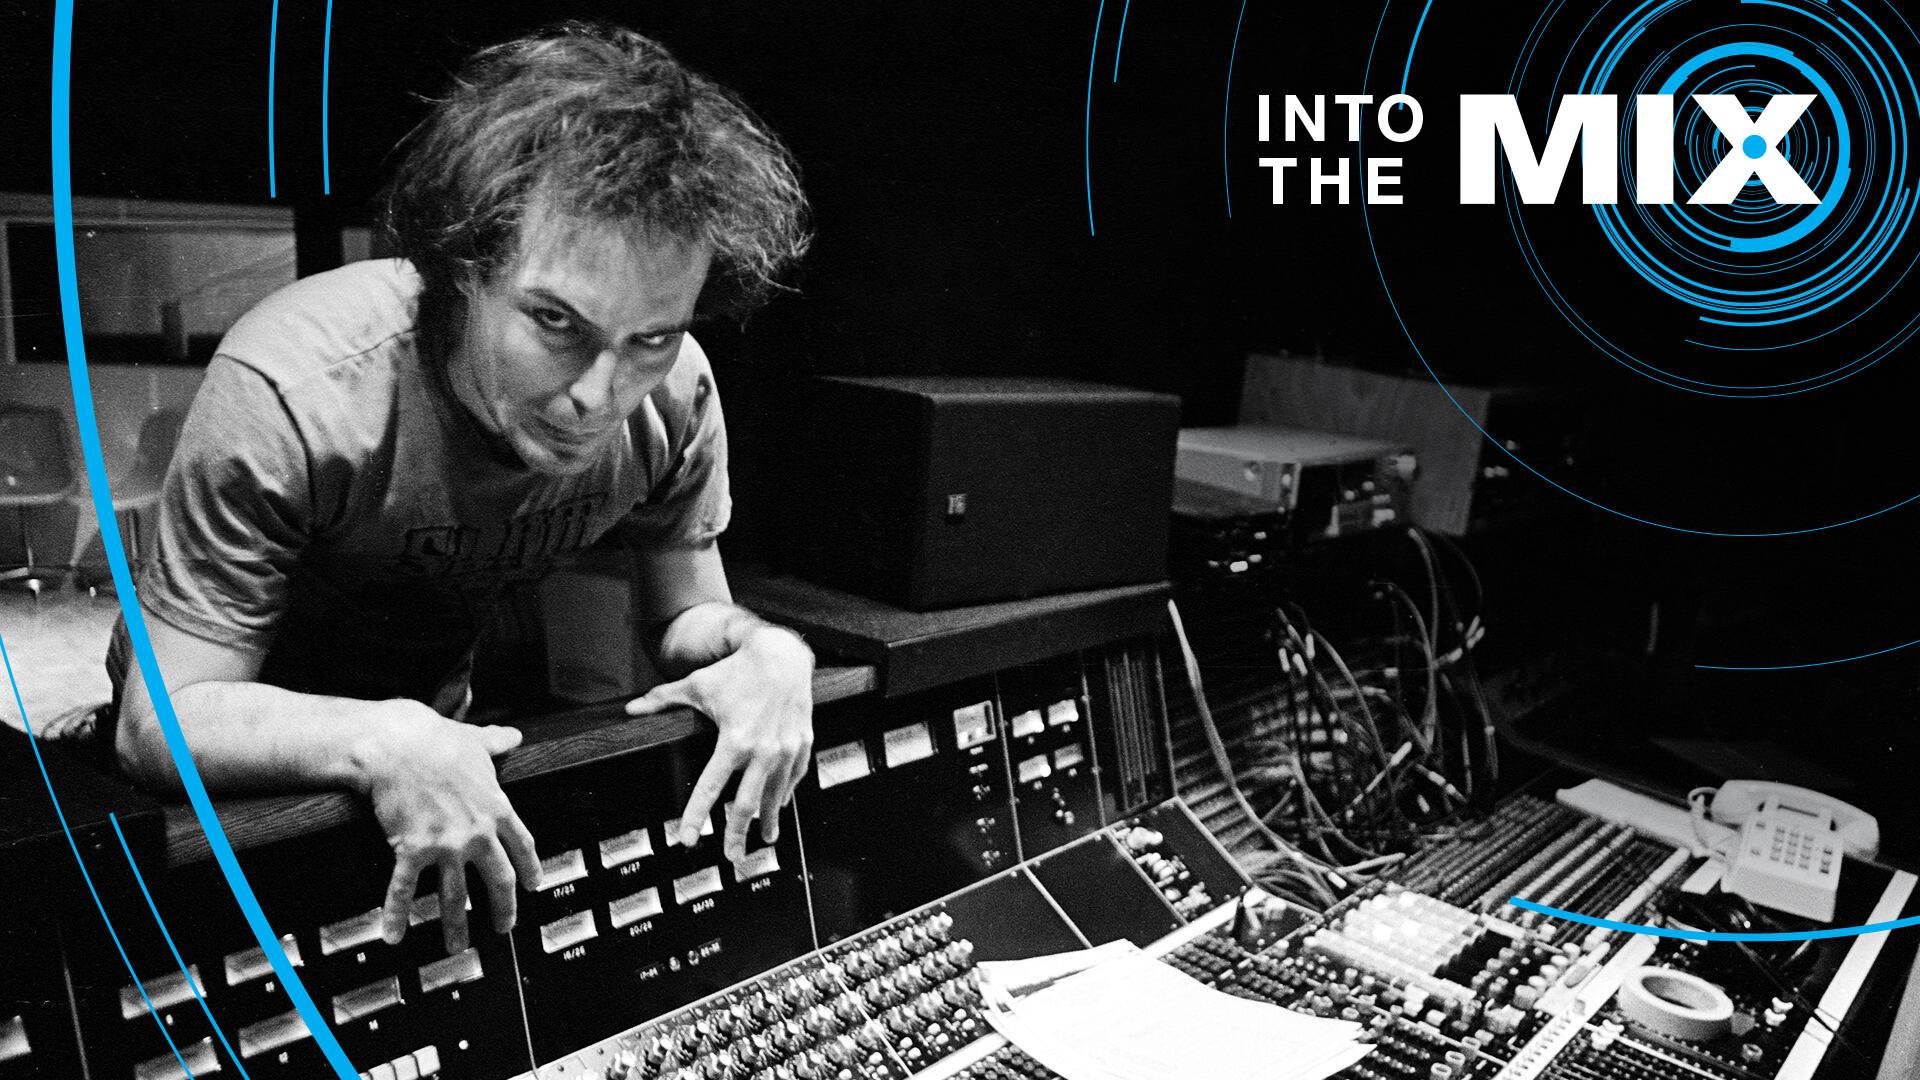 Jello Biafra of the Dead Kennedys in the studio Photo: John Cuniberti